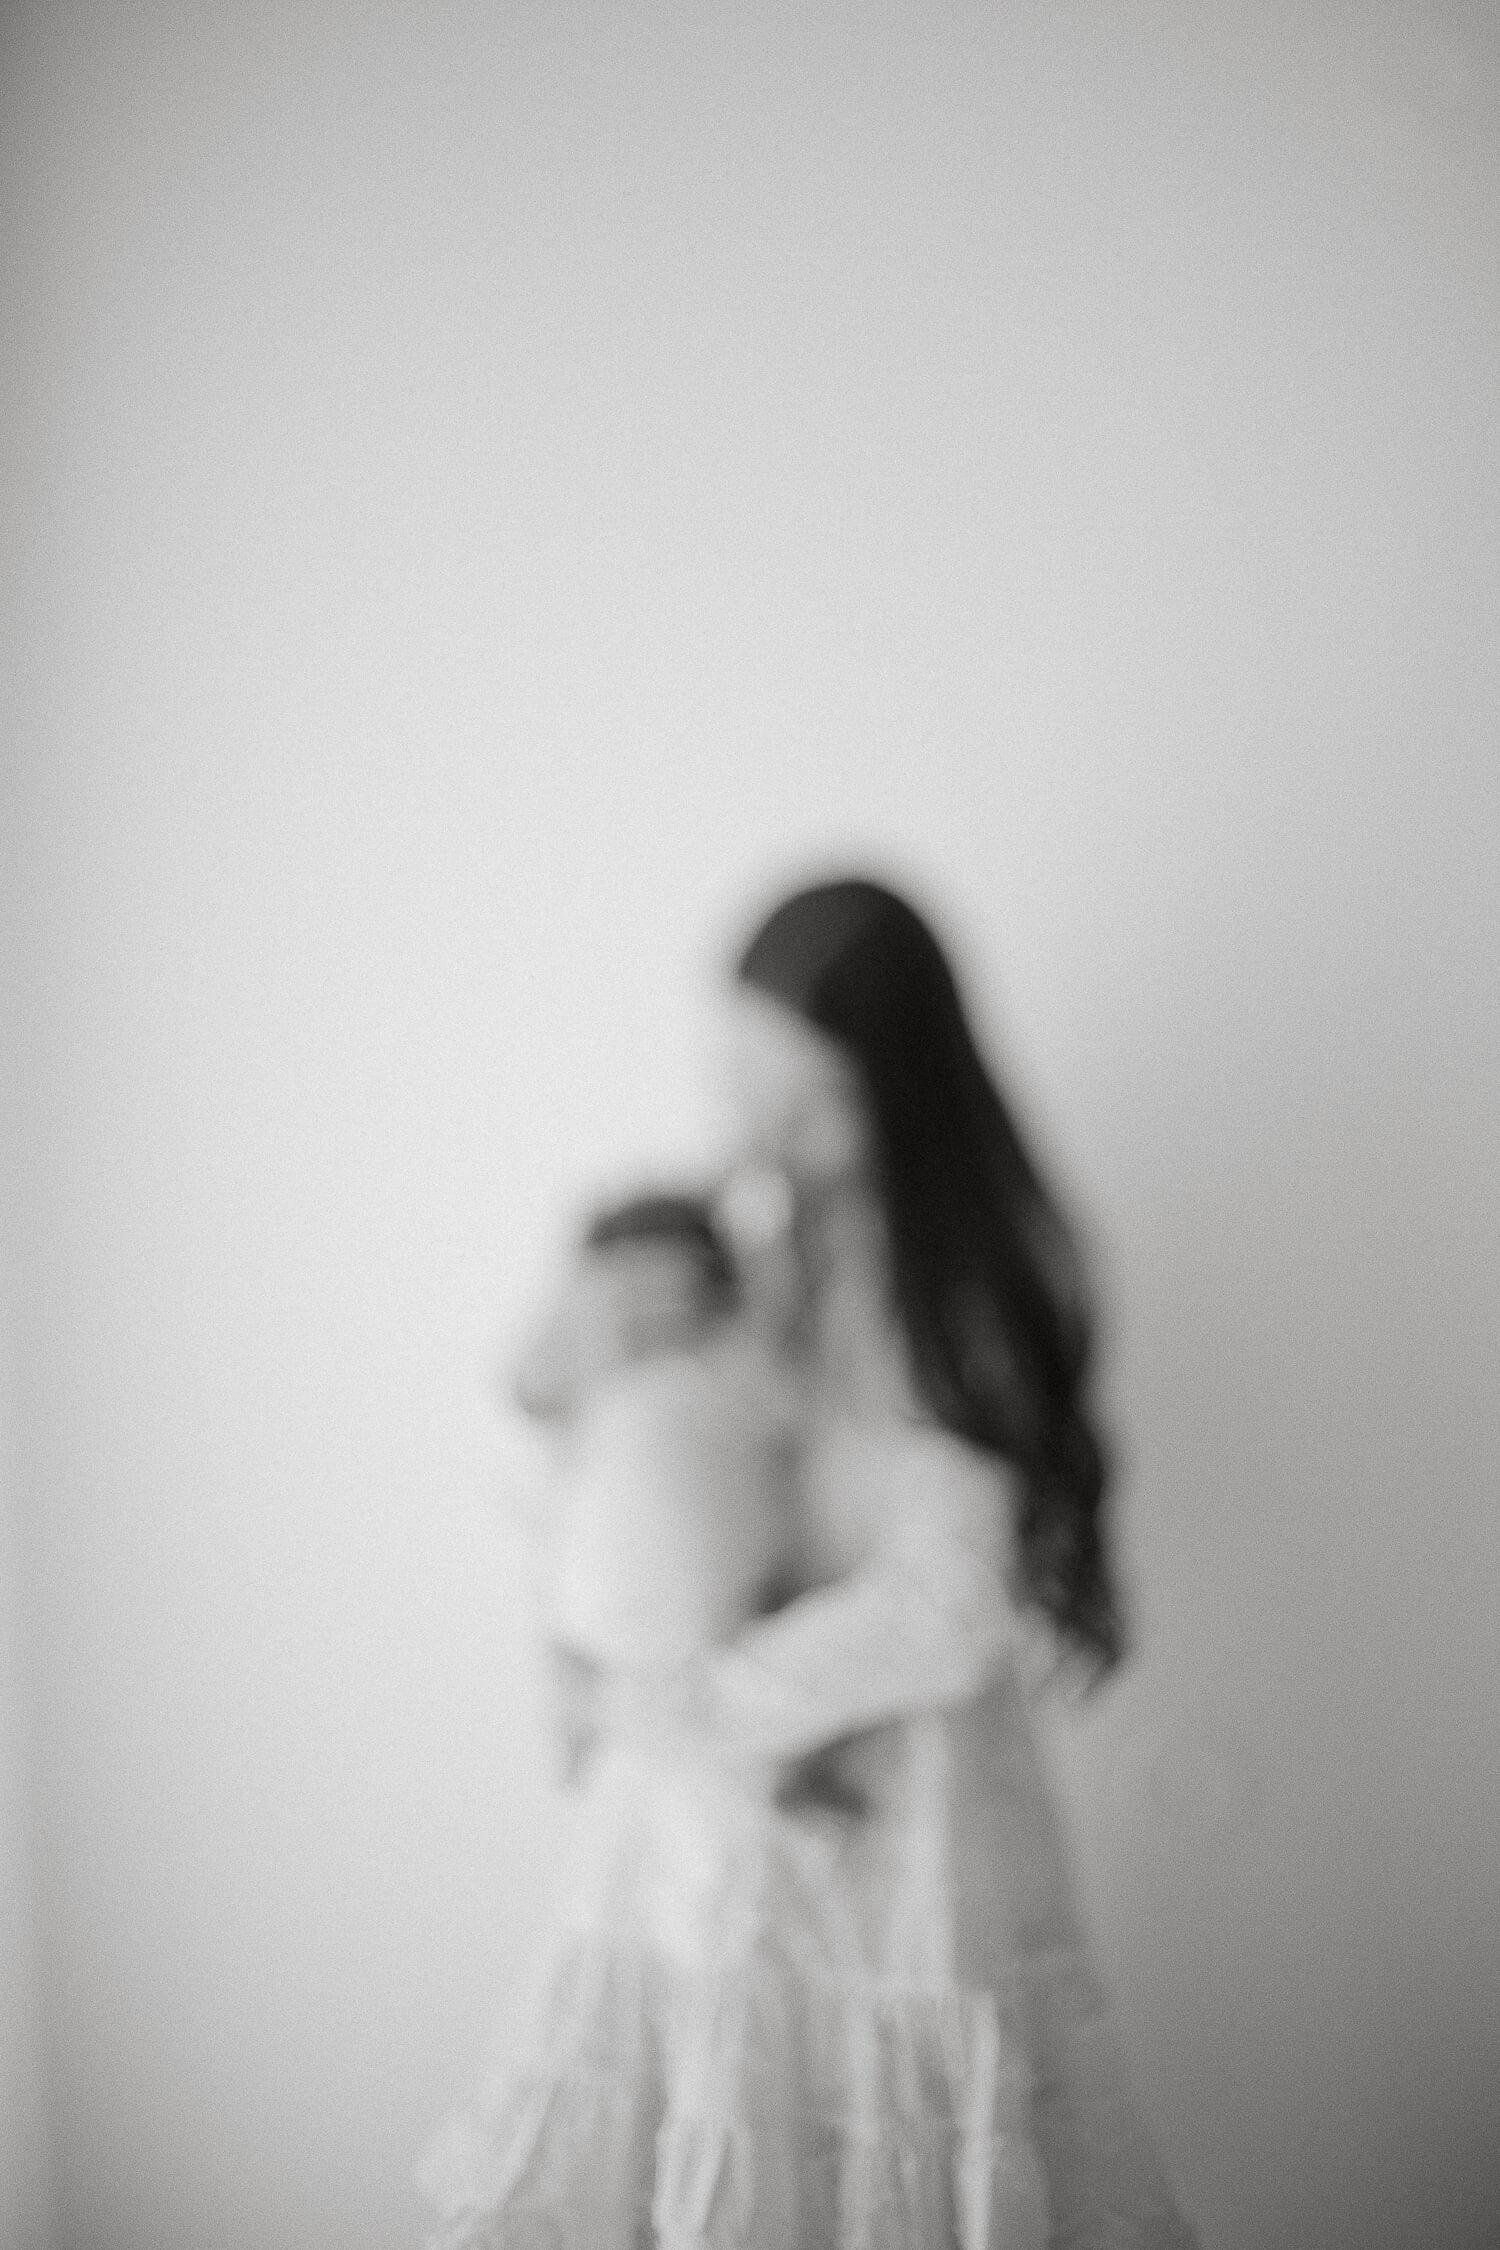 Helia Visuals workshop - ajatonta newbornkuvausta oppimassa. 48